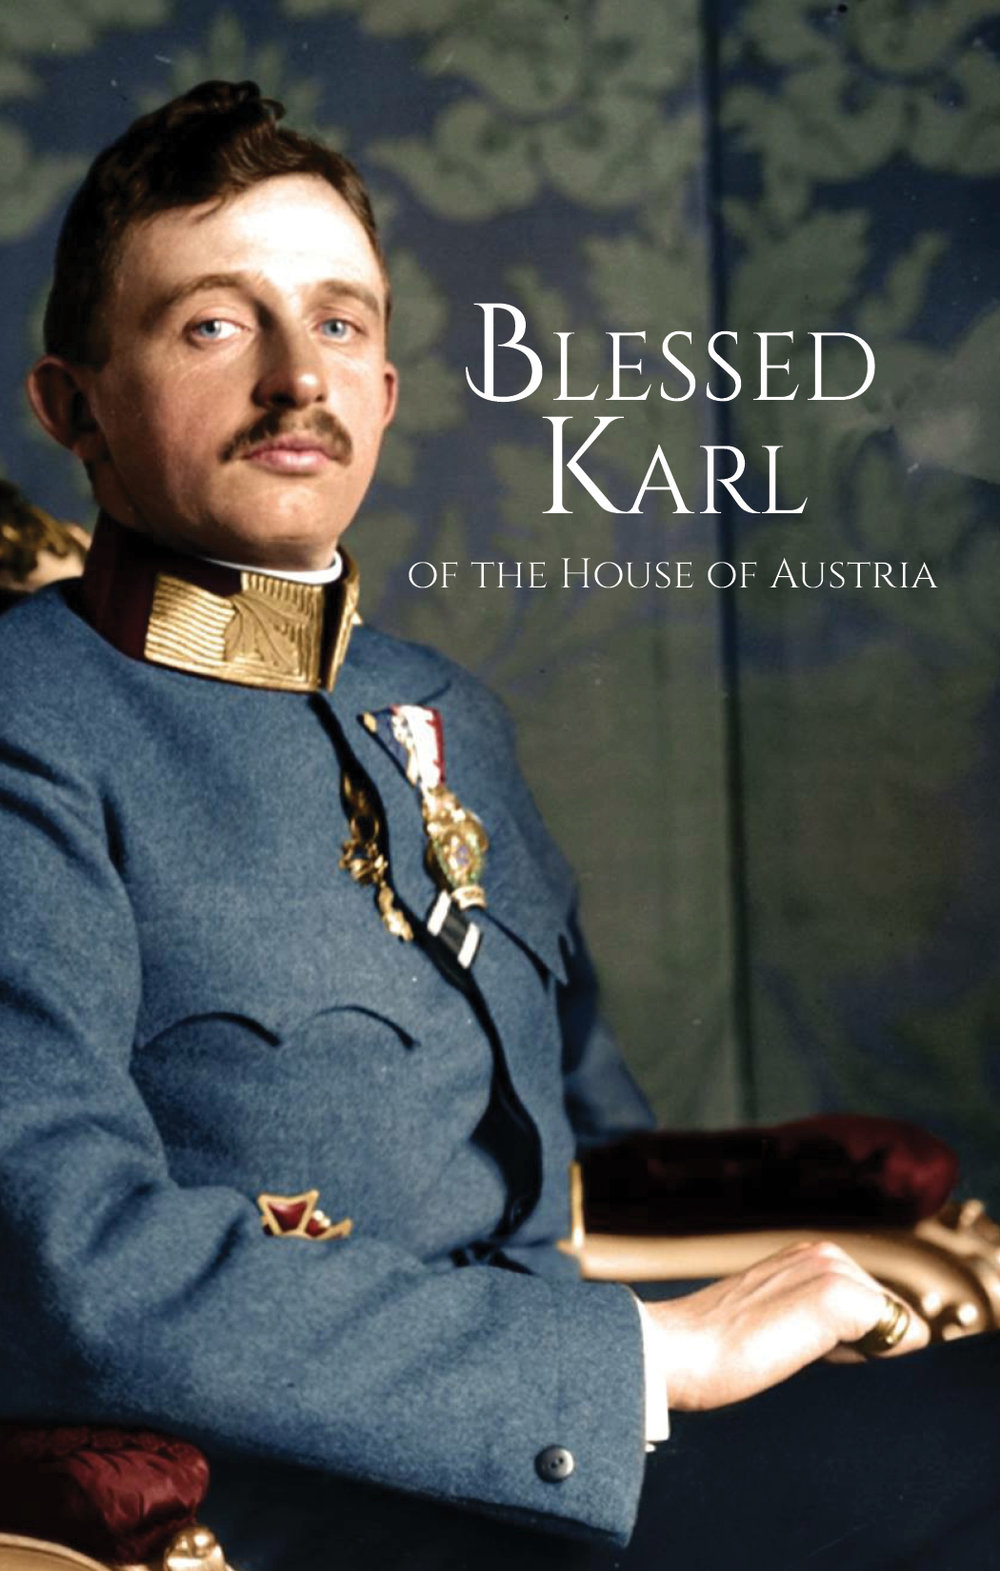 Emperor Karl Folding Card_1.jpg